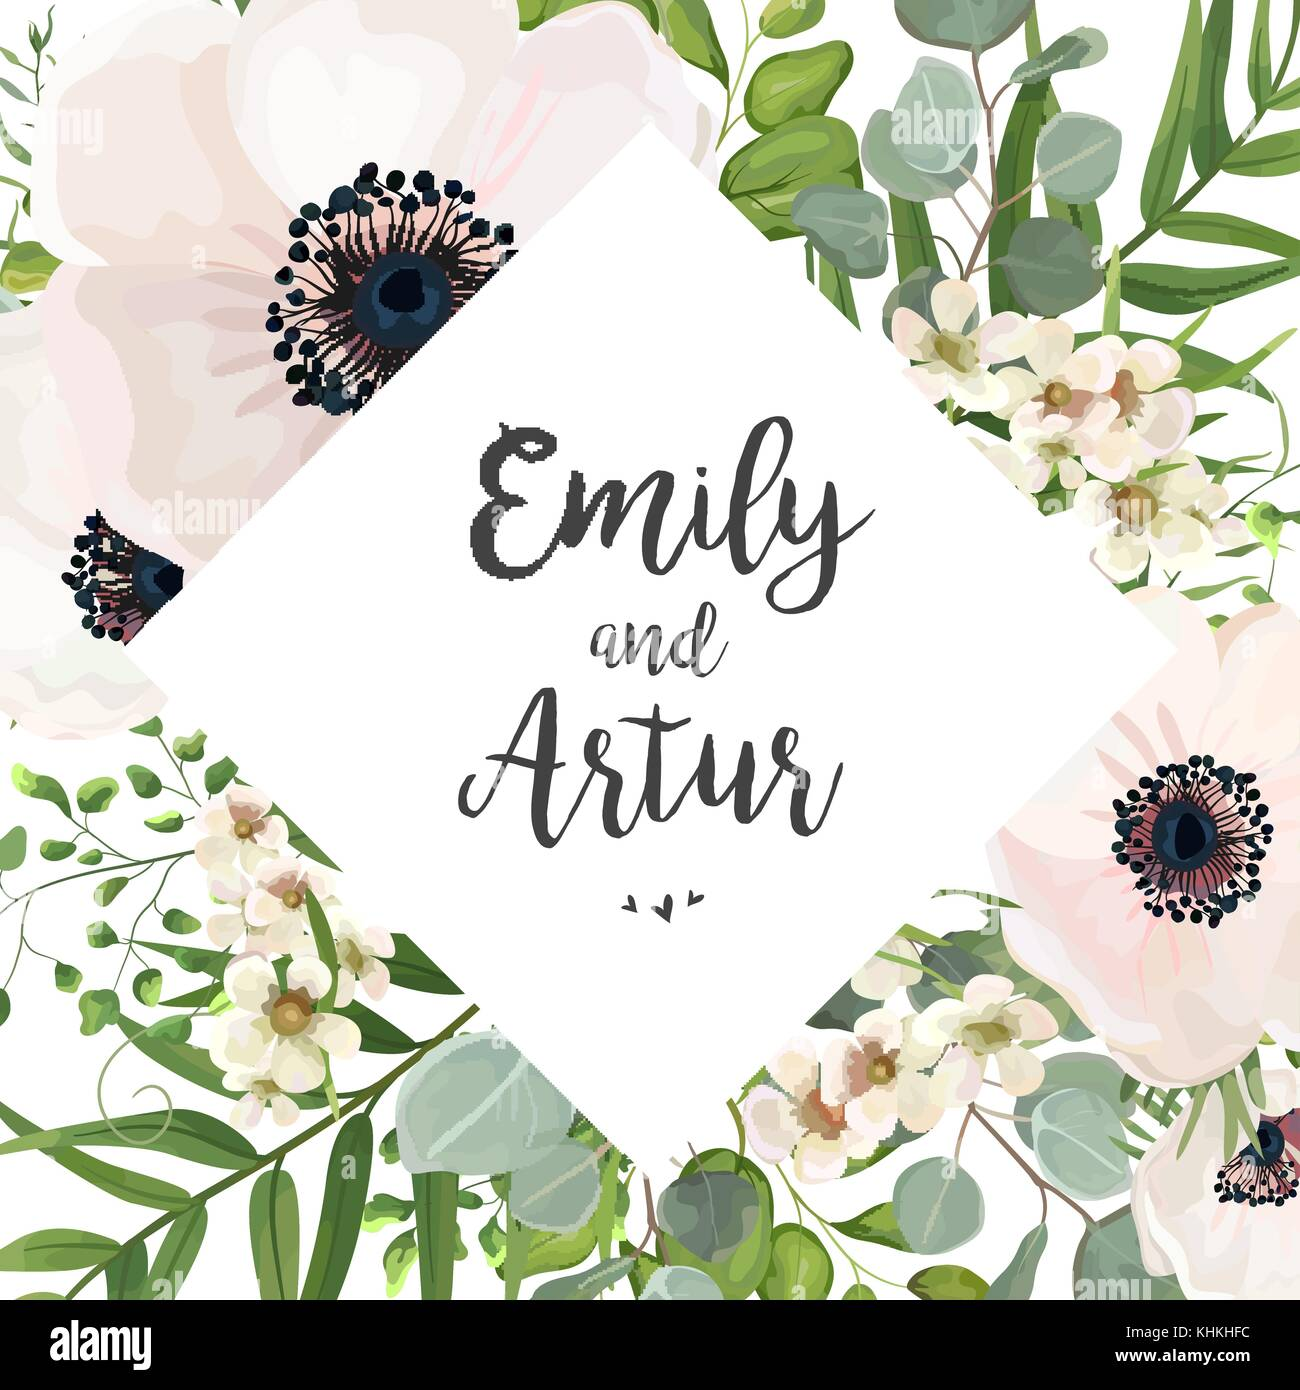 Flowers Vector Design Wedding Invitations Wedding: Vector Floral Wedding Invite Card Design: Eucalyptus